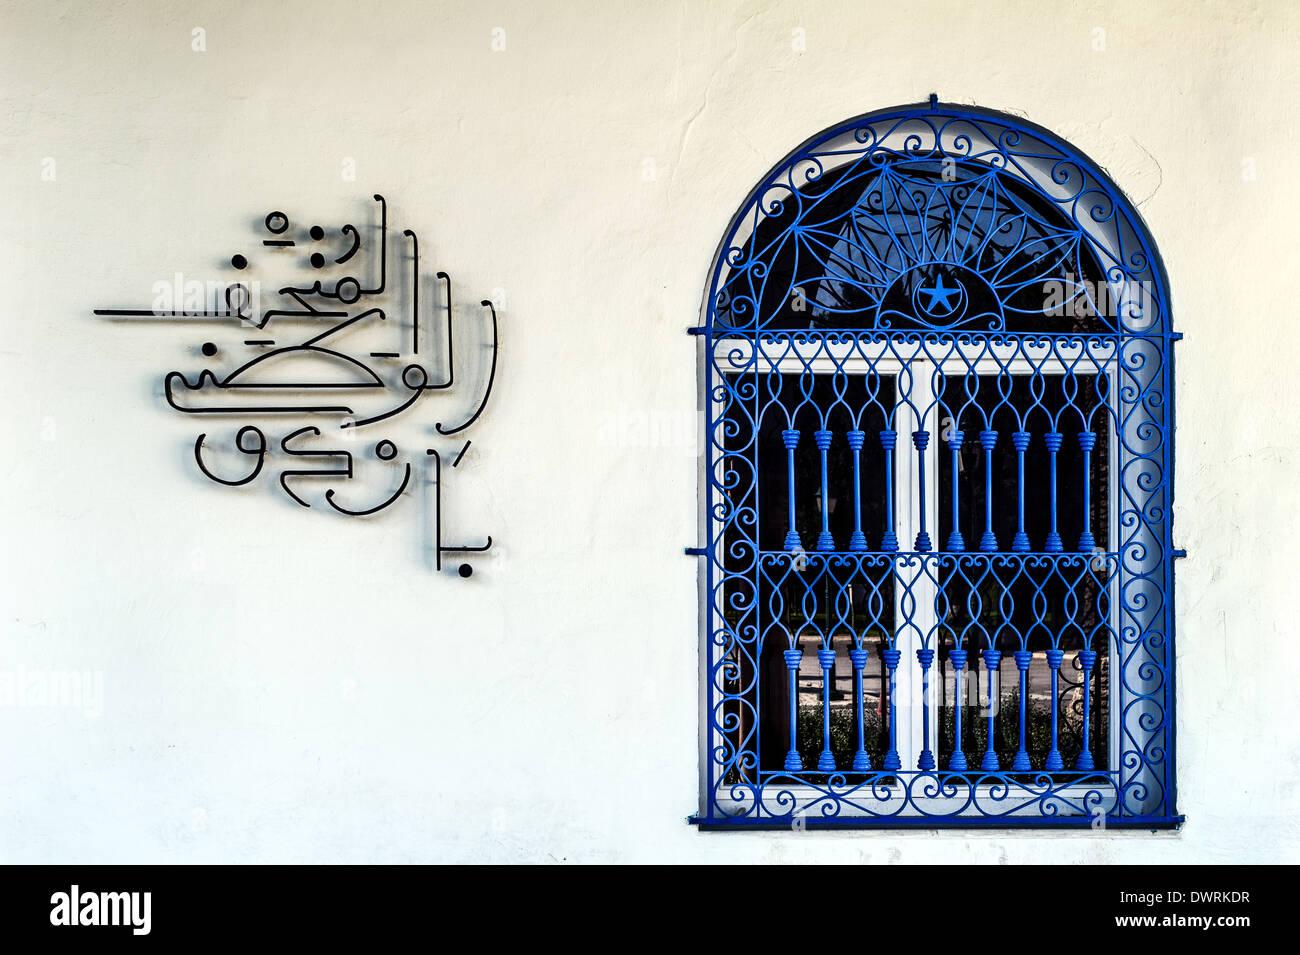 North Africa, Tunisia, Tunis. The Bardo Museum. Facade. Stock Photo